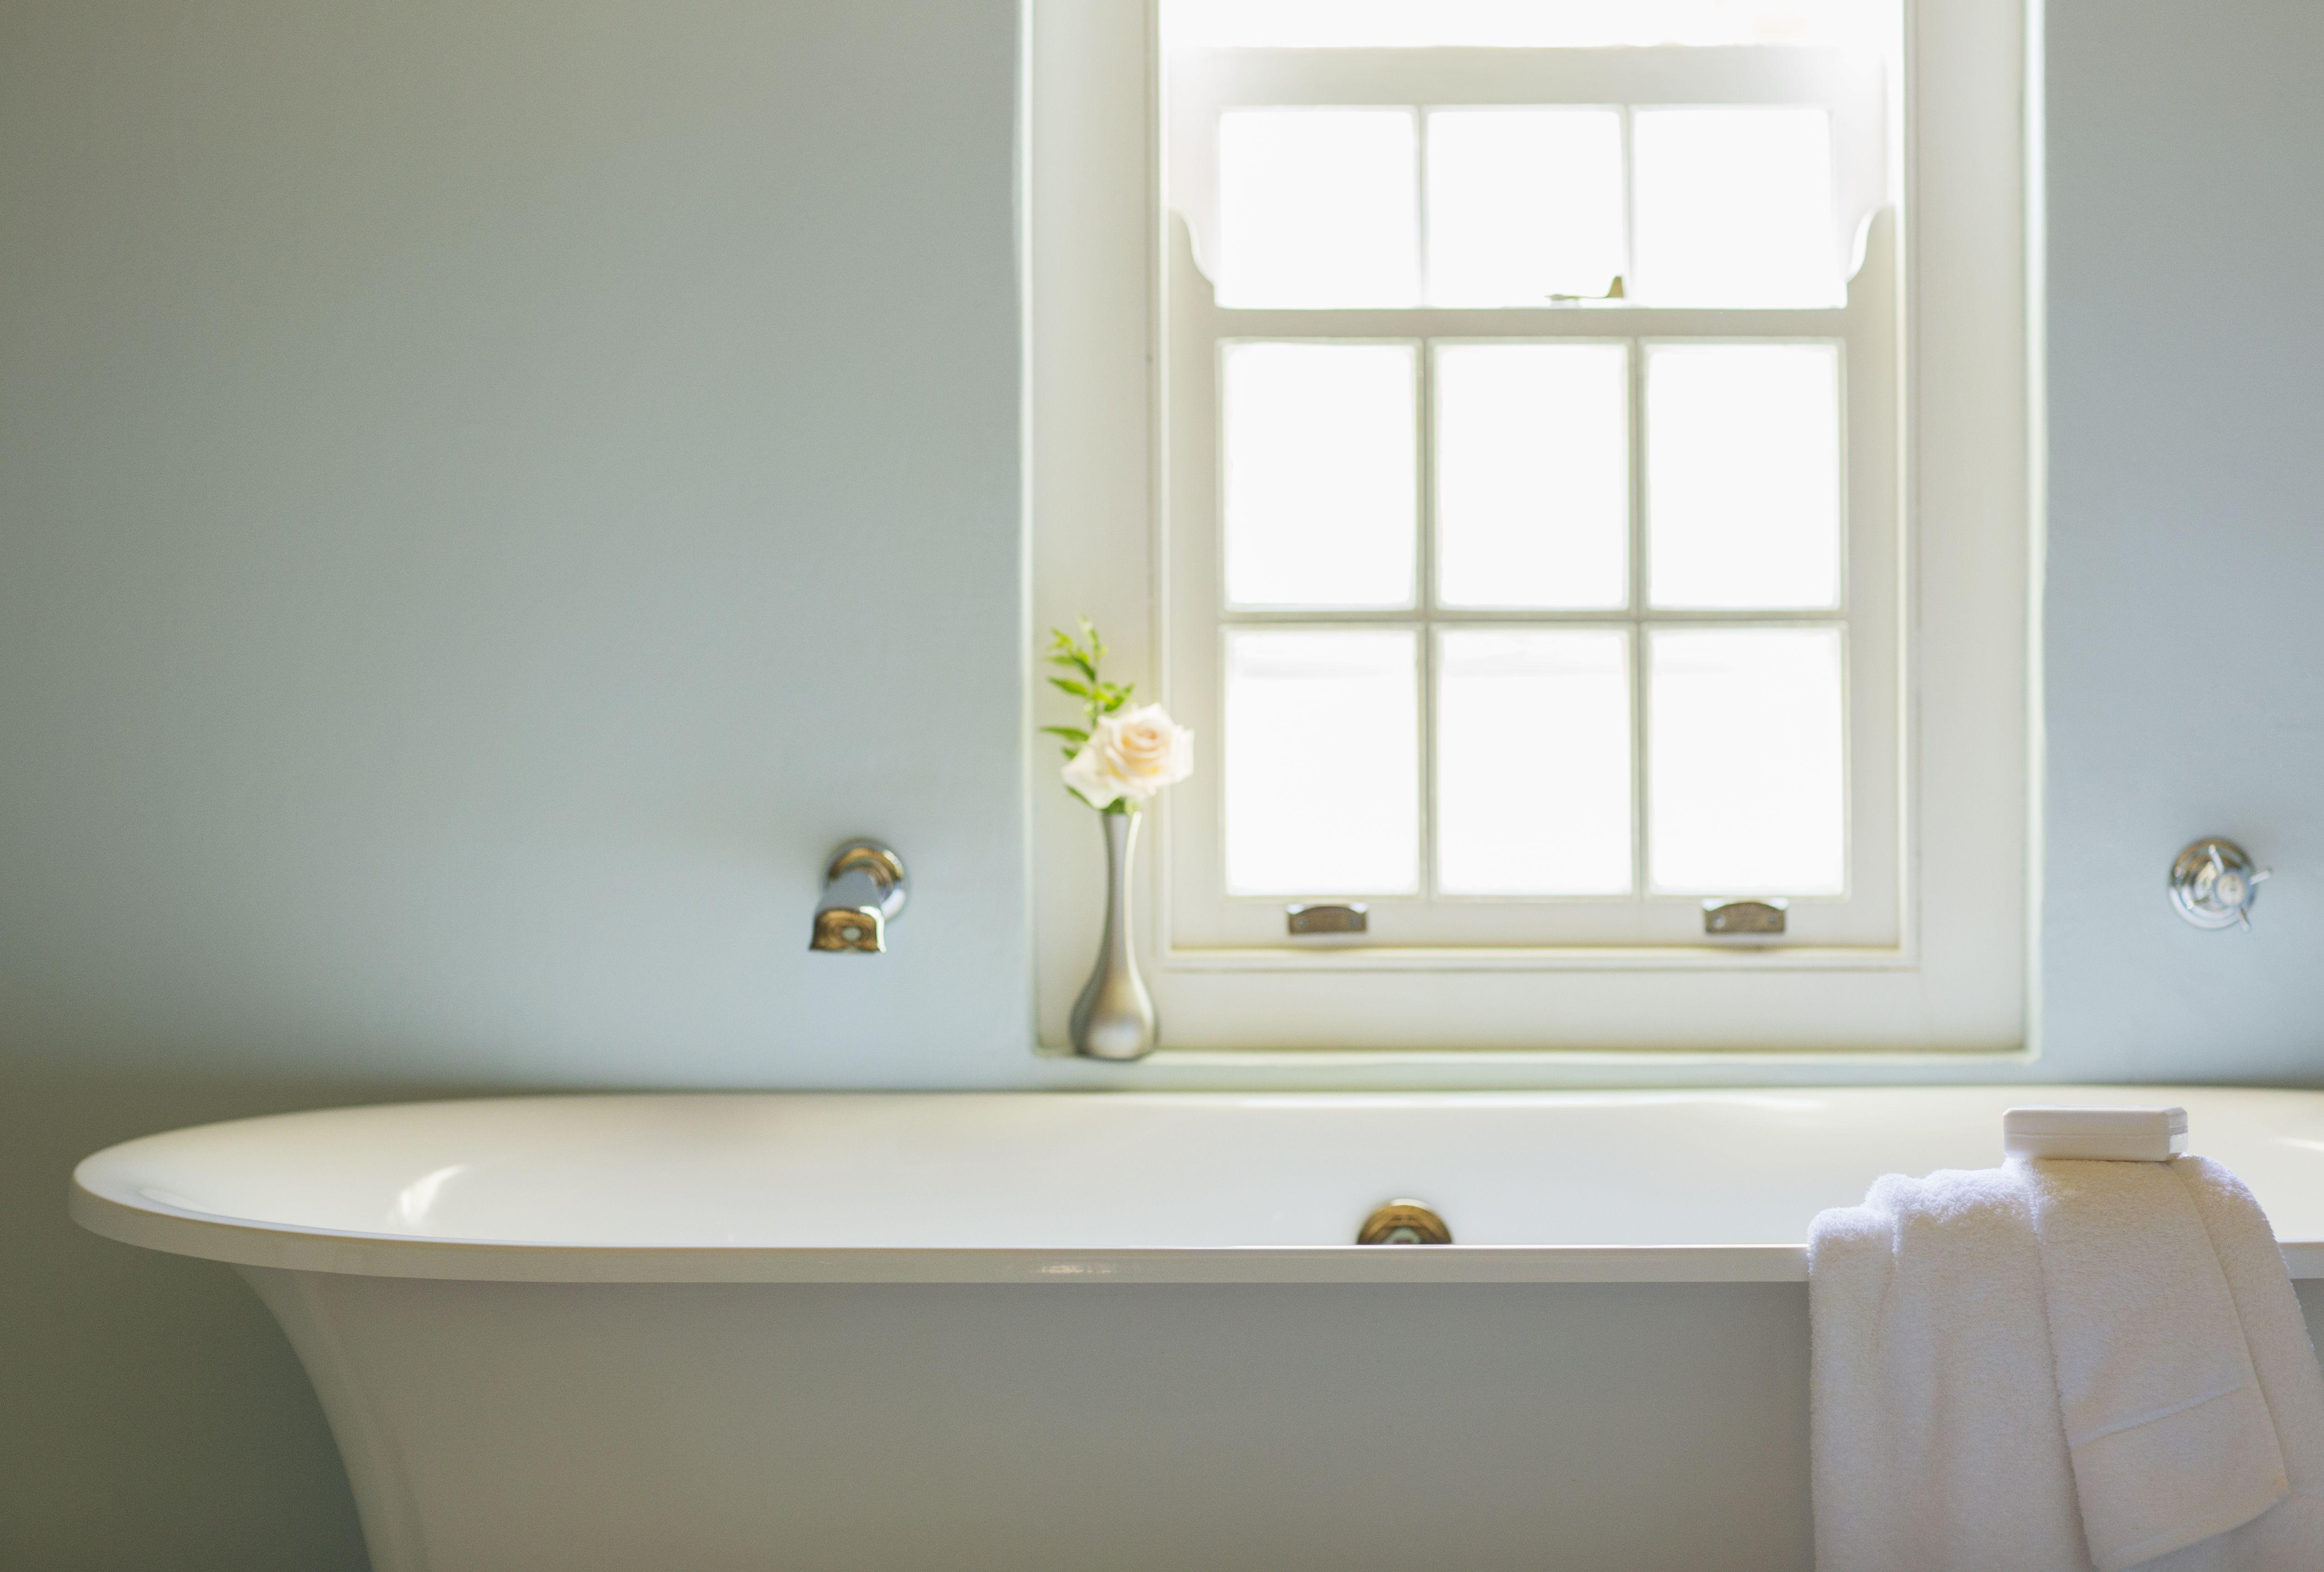 How To Choose The Best Bathtub Fiberglass Vs Cast Iron